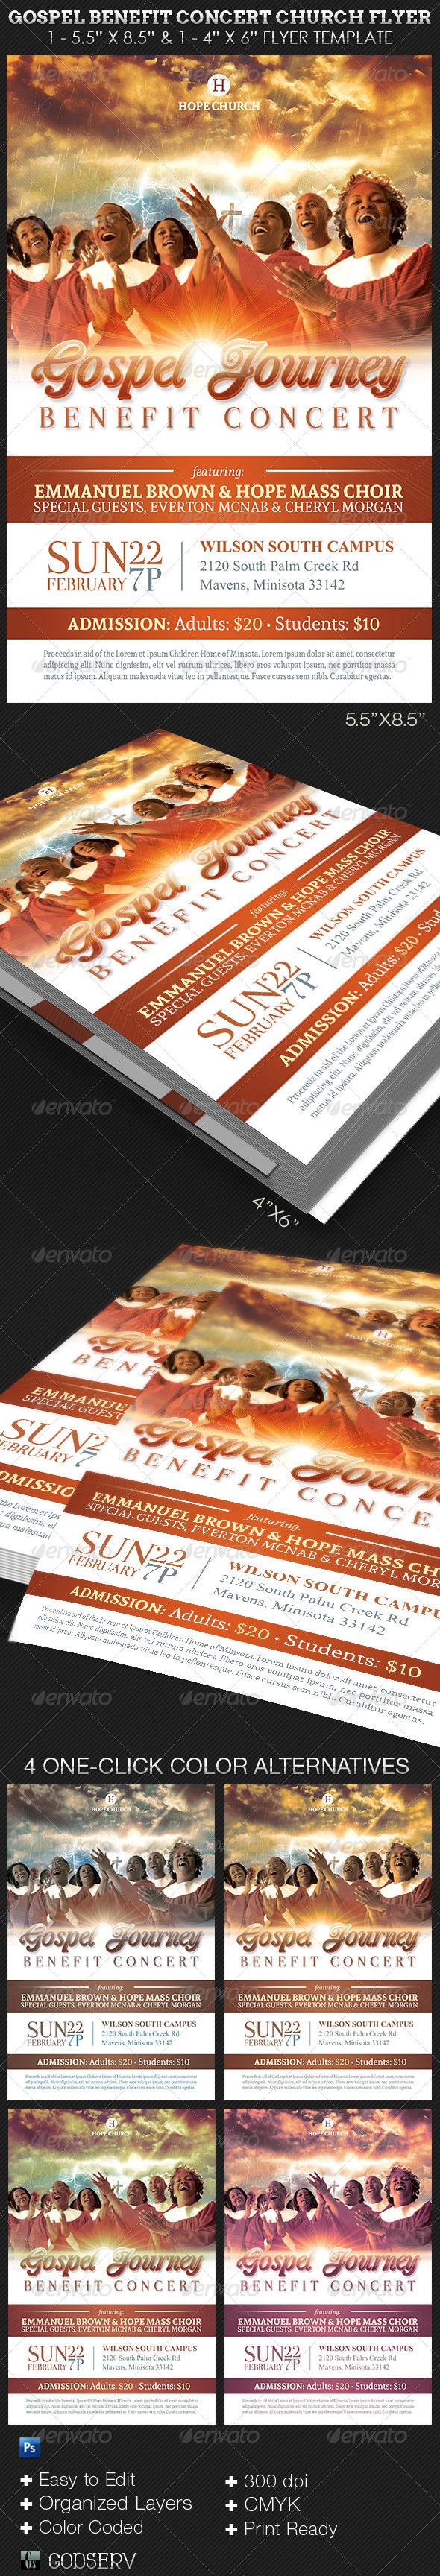 Michael Taylor Godserv Print Template Portfolio Gospel Benefit